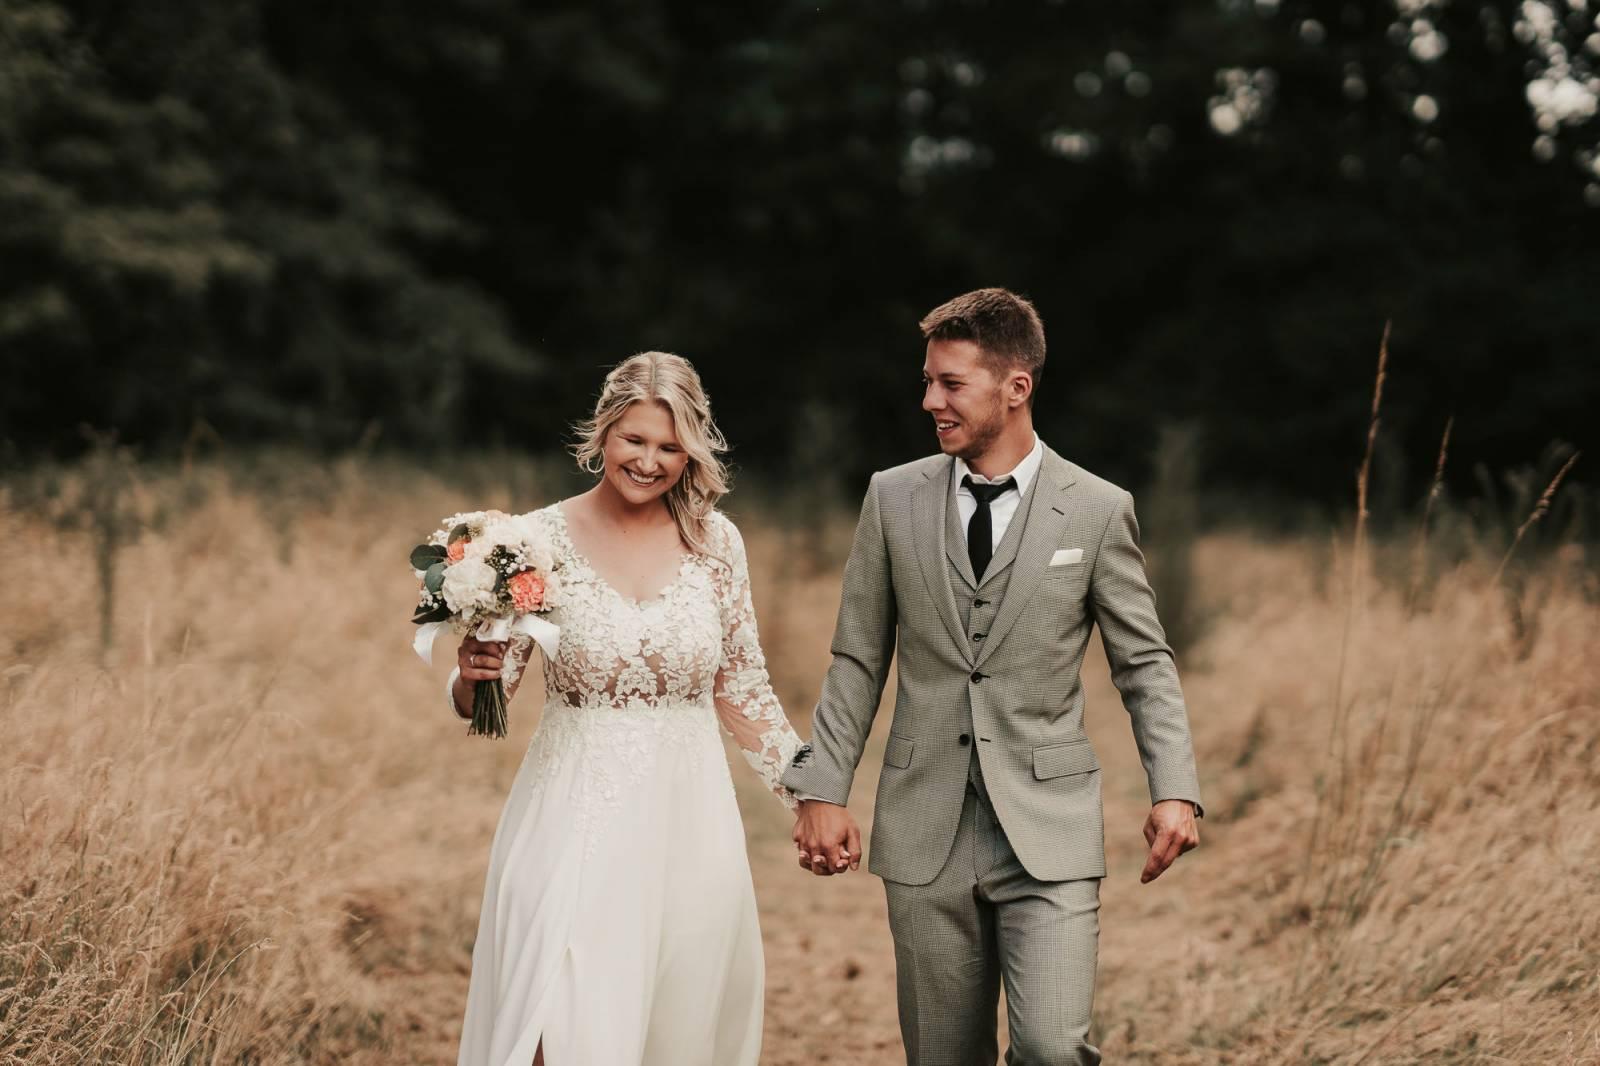 Alex VDB - House of Weddings - 20